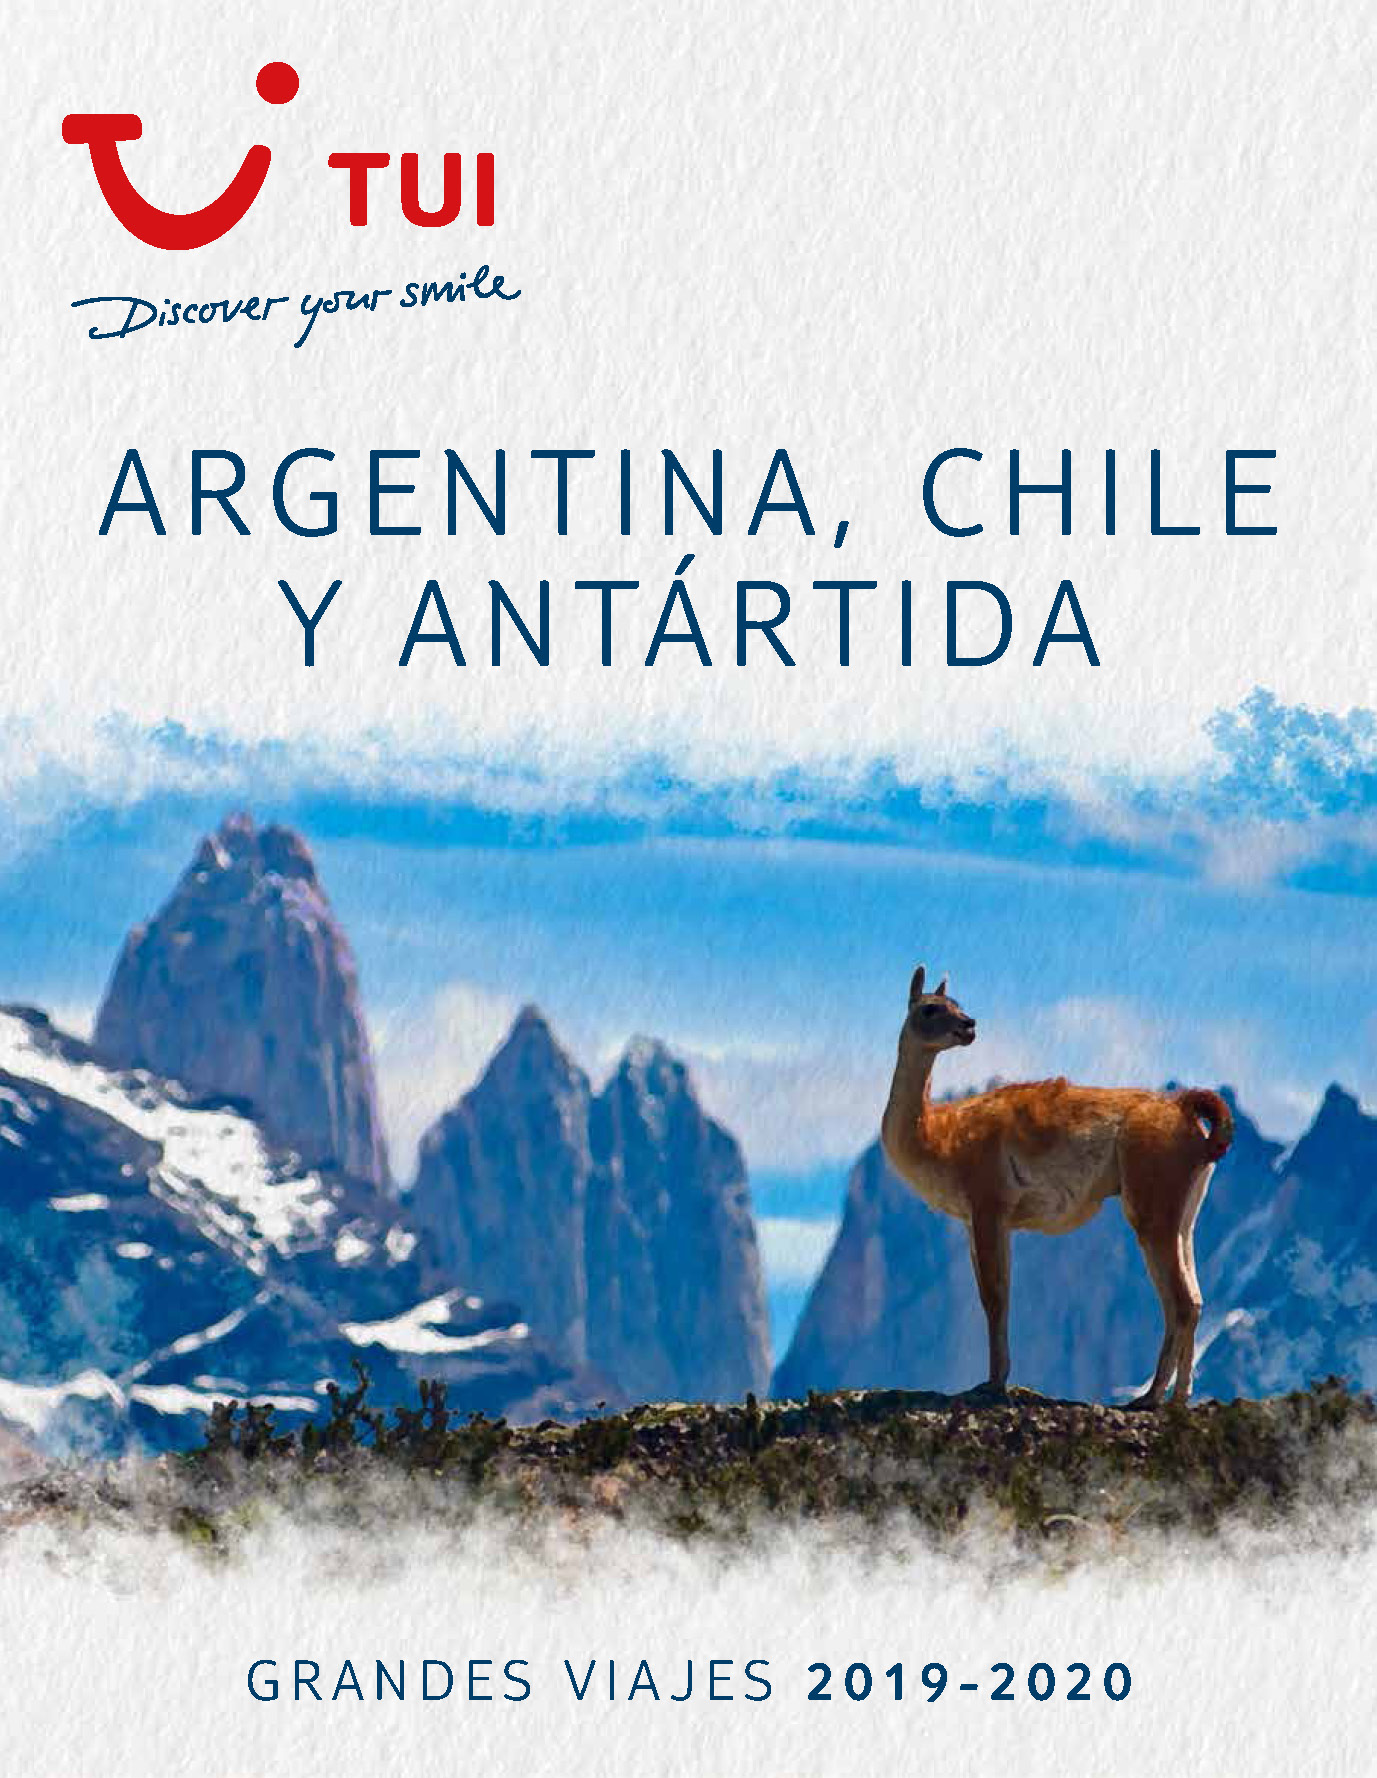 Catalogo TUI Ambassador Tours Argentina Chile y Antartida 2019-2020